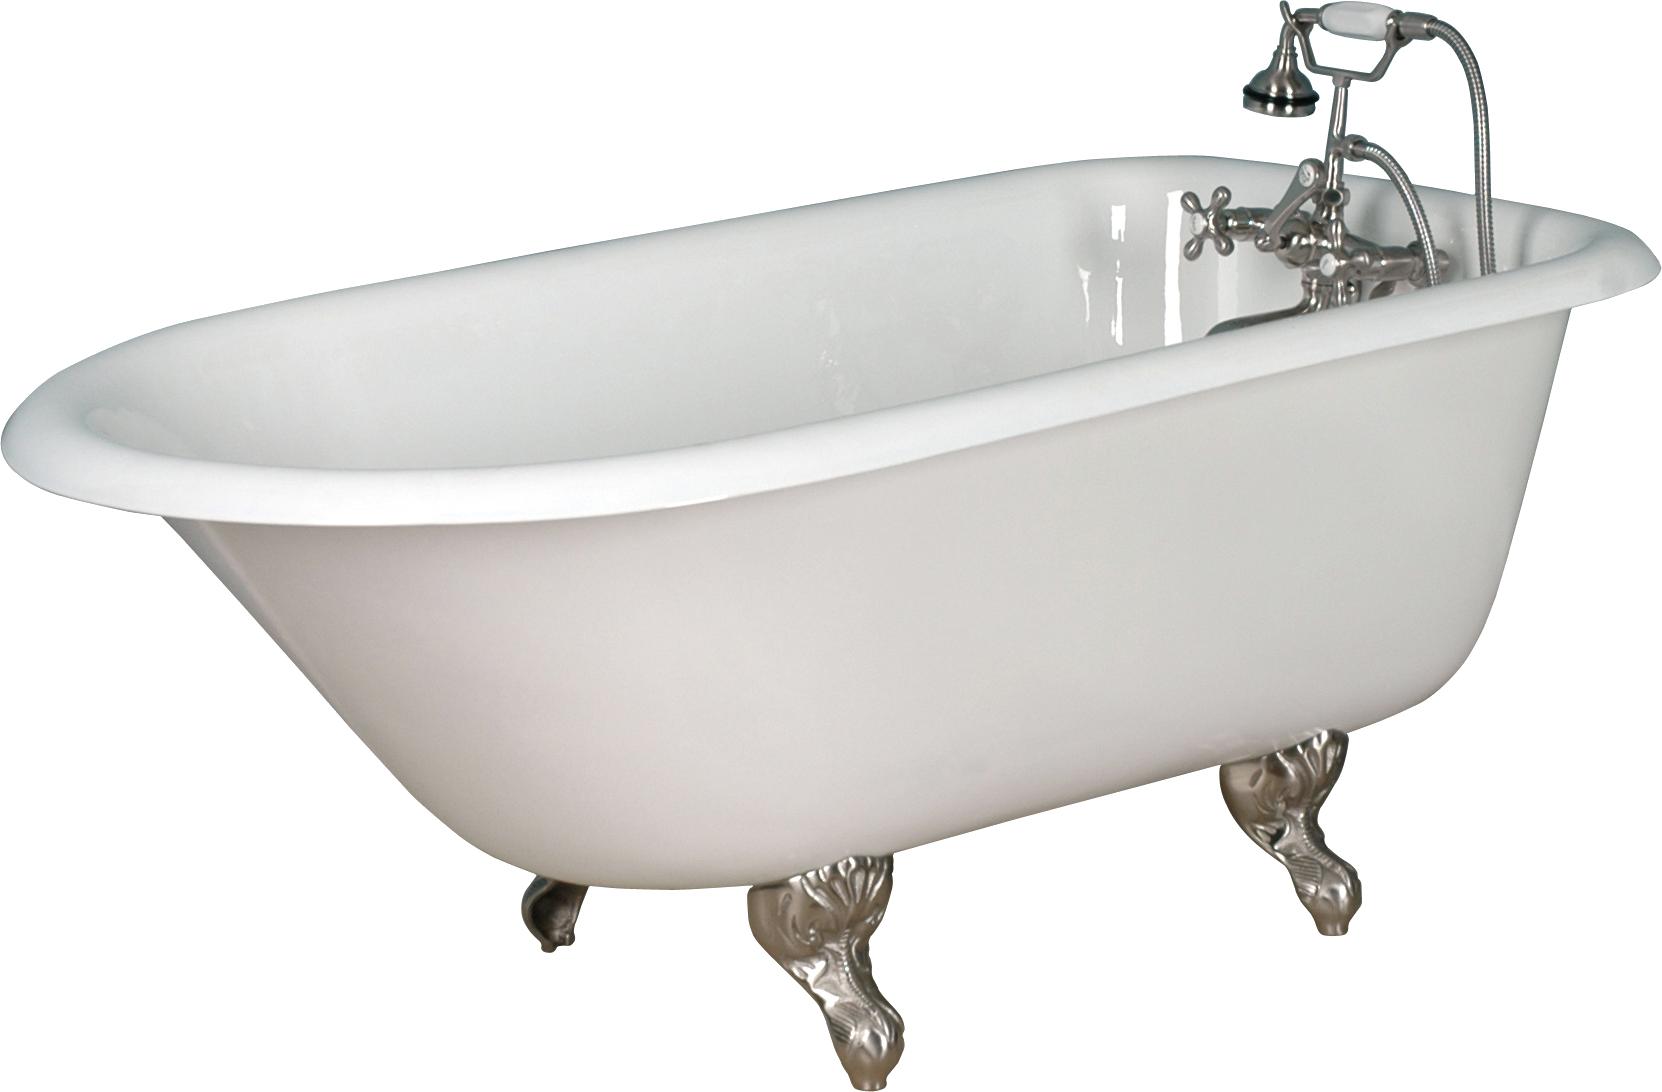 Bath Tub PNG HD Transparent Bath Tub HD.PNG Images..